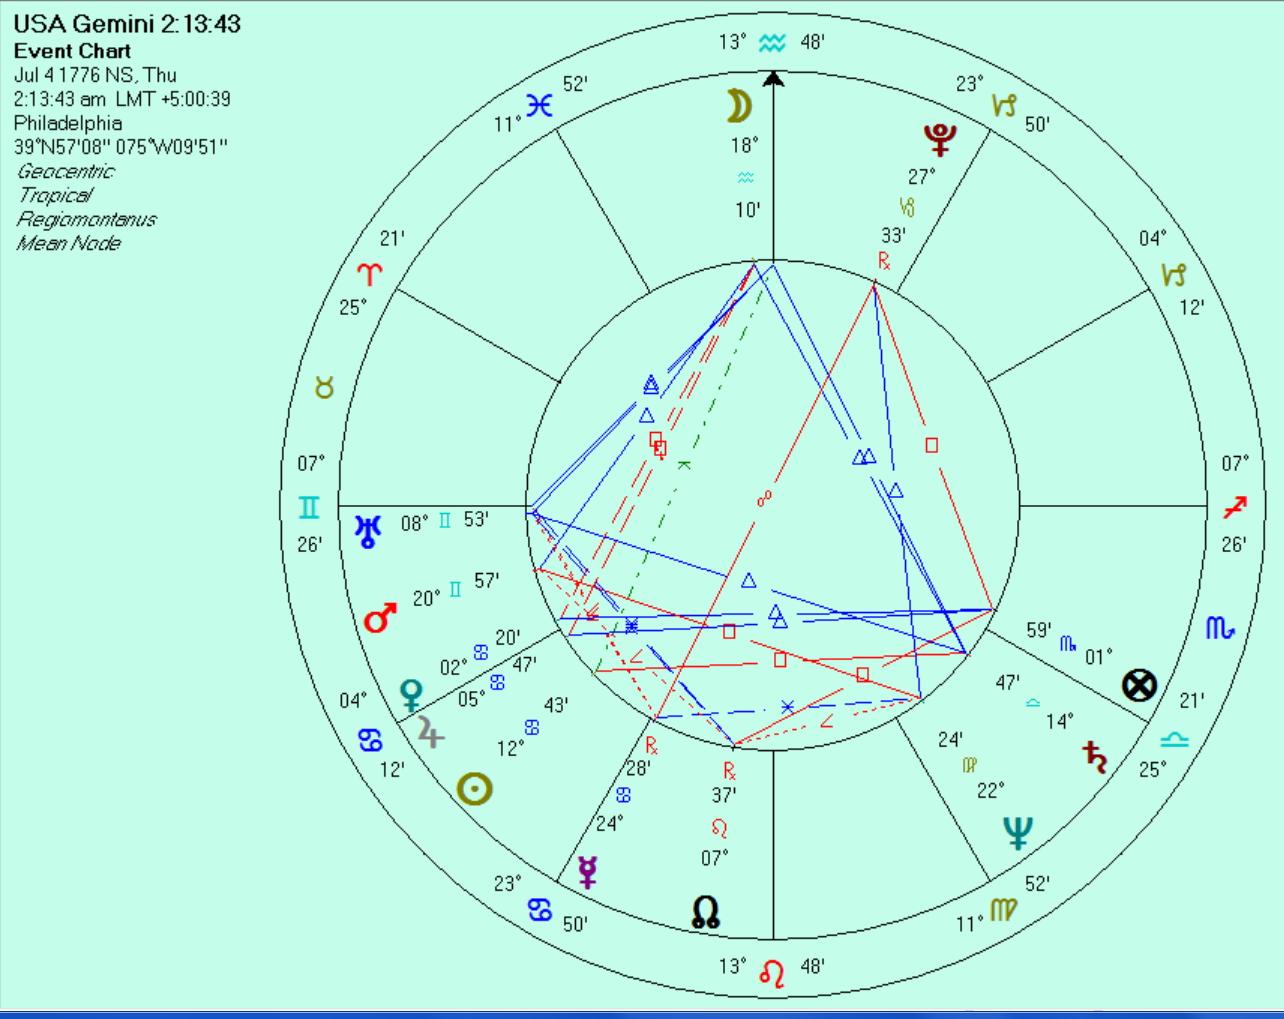 Tweaking the usa gemini rising chart to 21343 am anthony usa 7 gemini 26 rising chart for 21343 am nvjuhfo Gallery